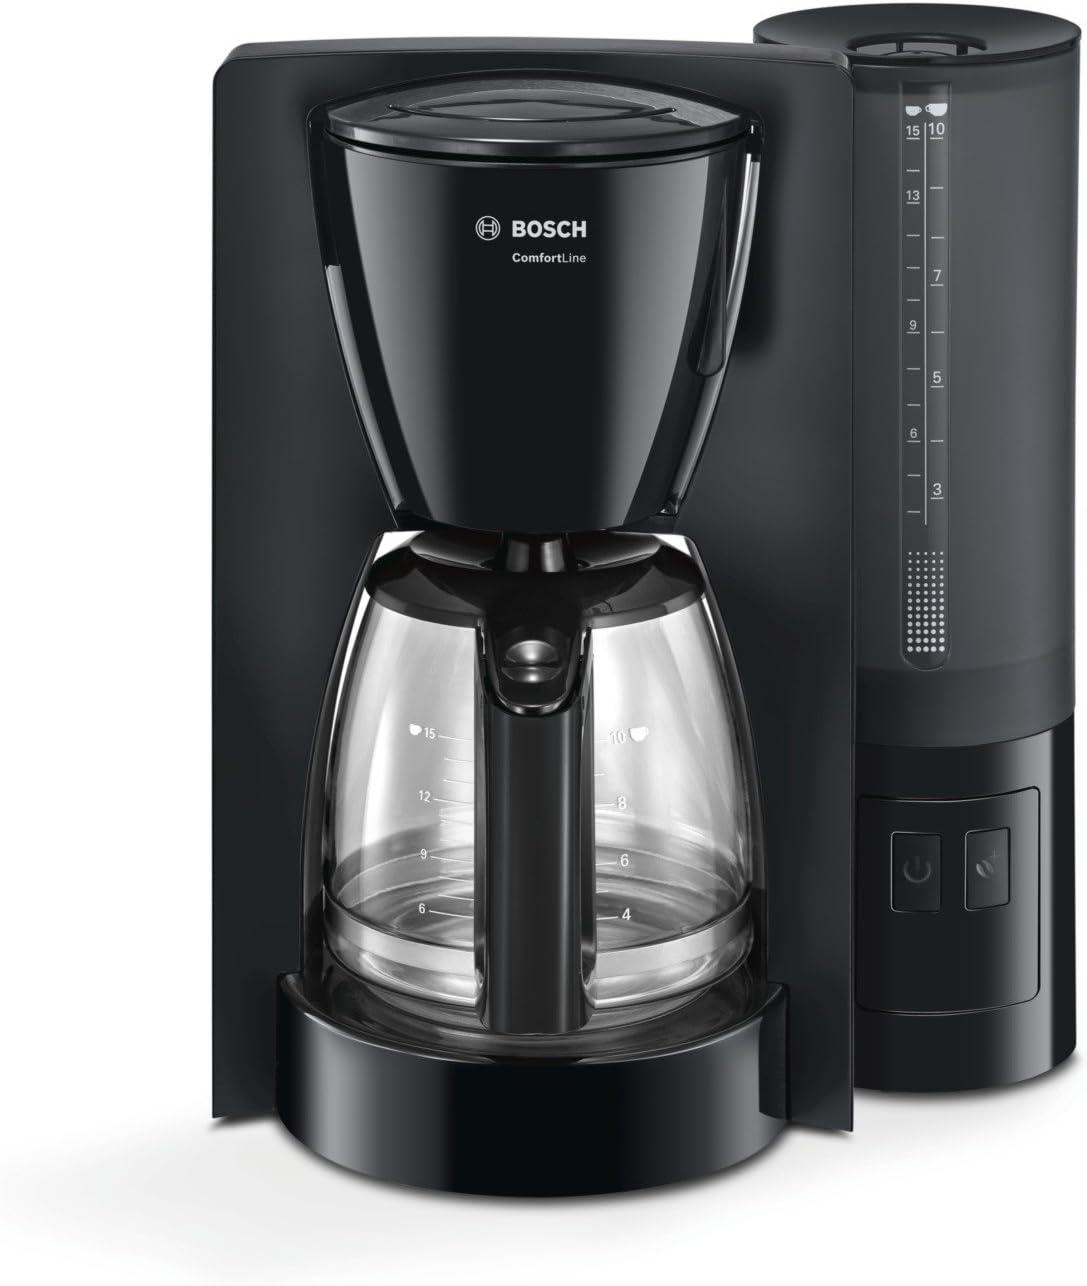 Bosch Comfort Line TKA6A043 - Cafetera de filtro / goteo, 1200 W ...